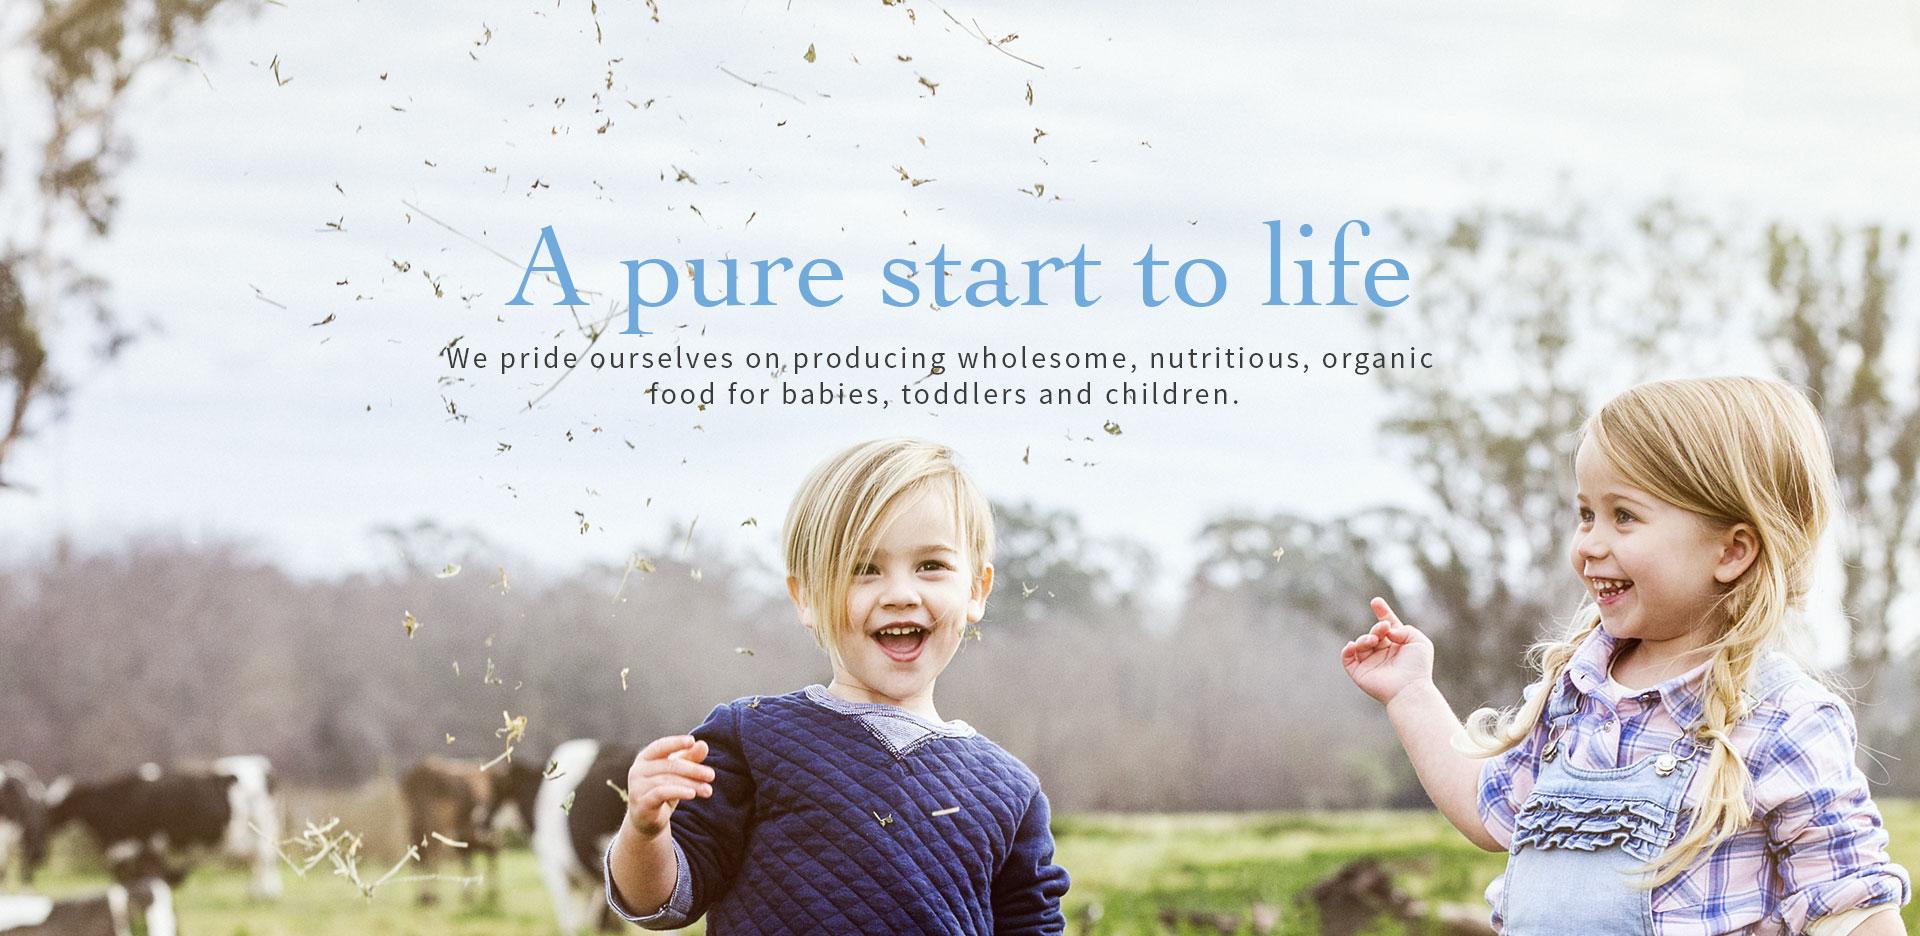 A pure life